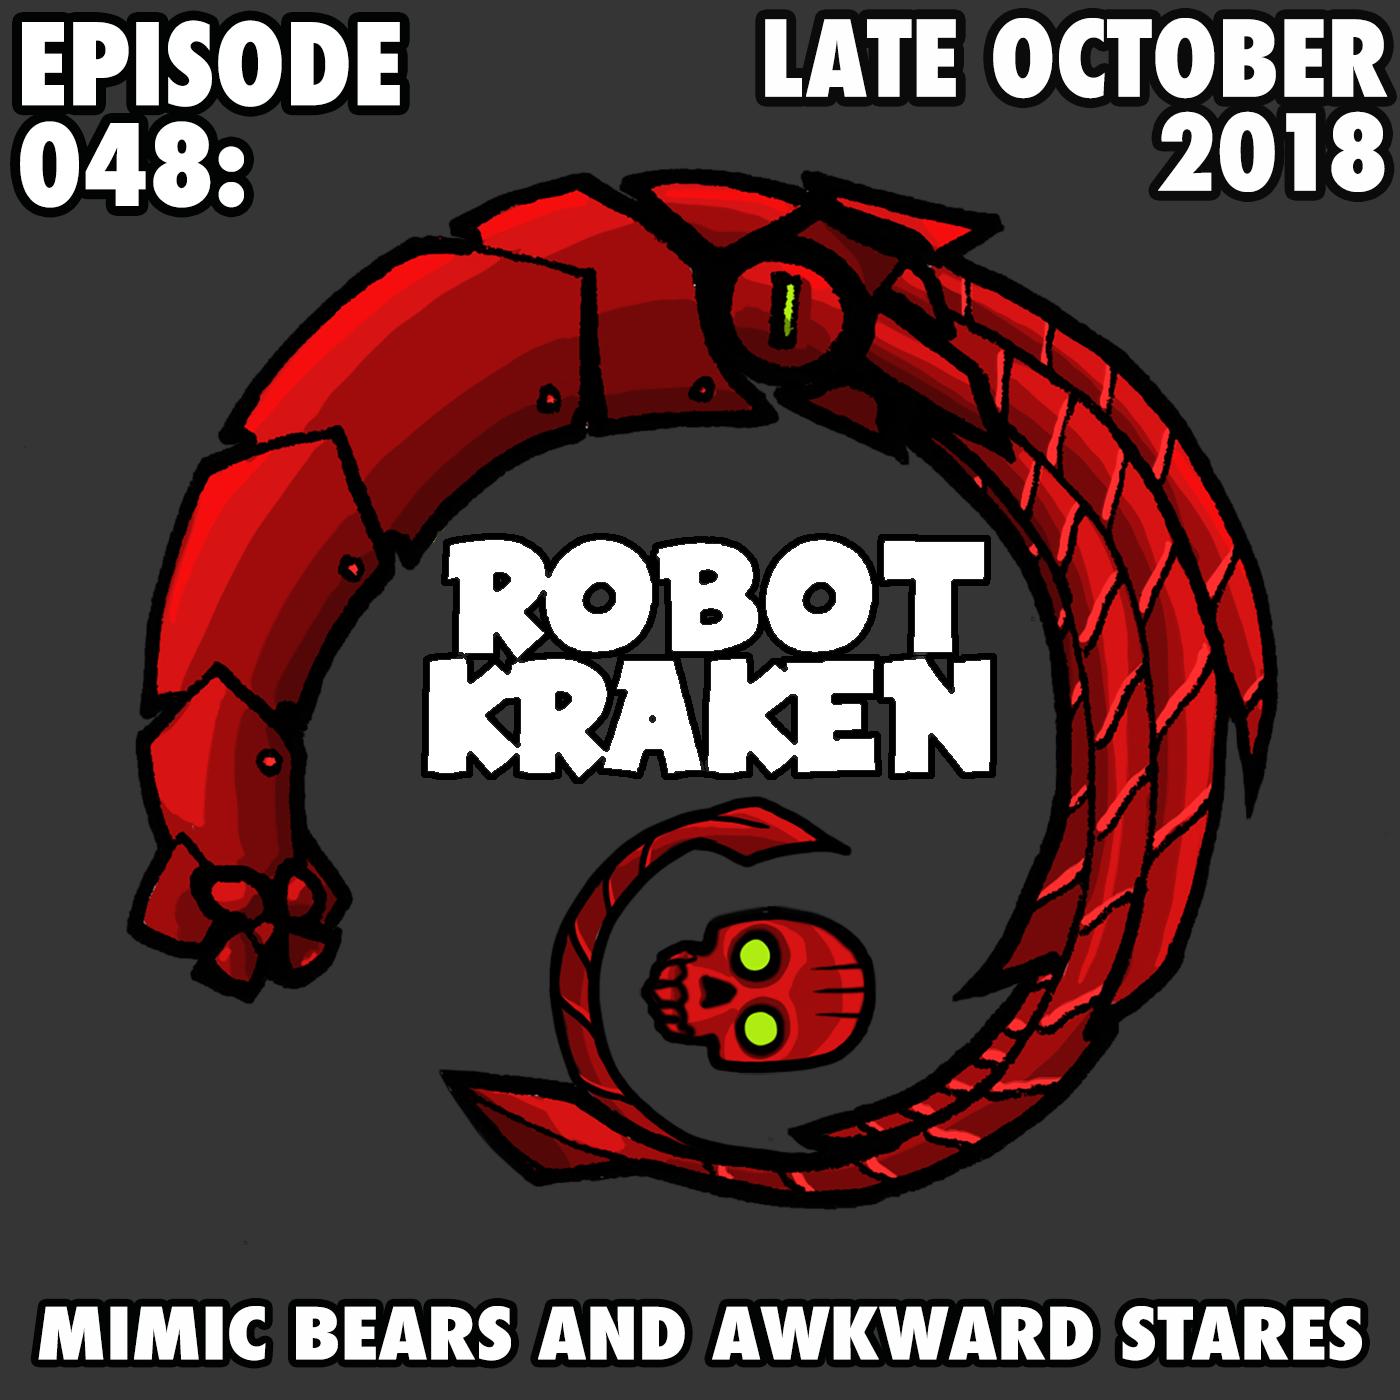 Robot-Kraken-048-Cover.png